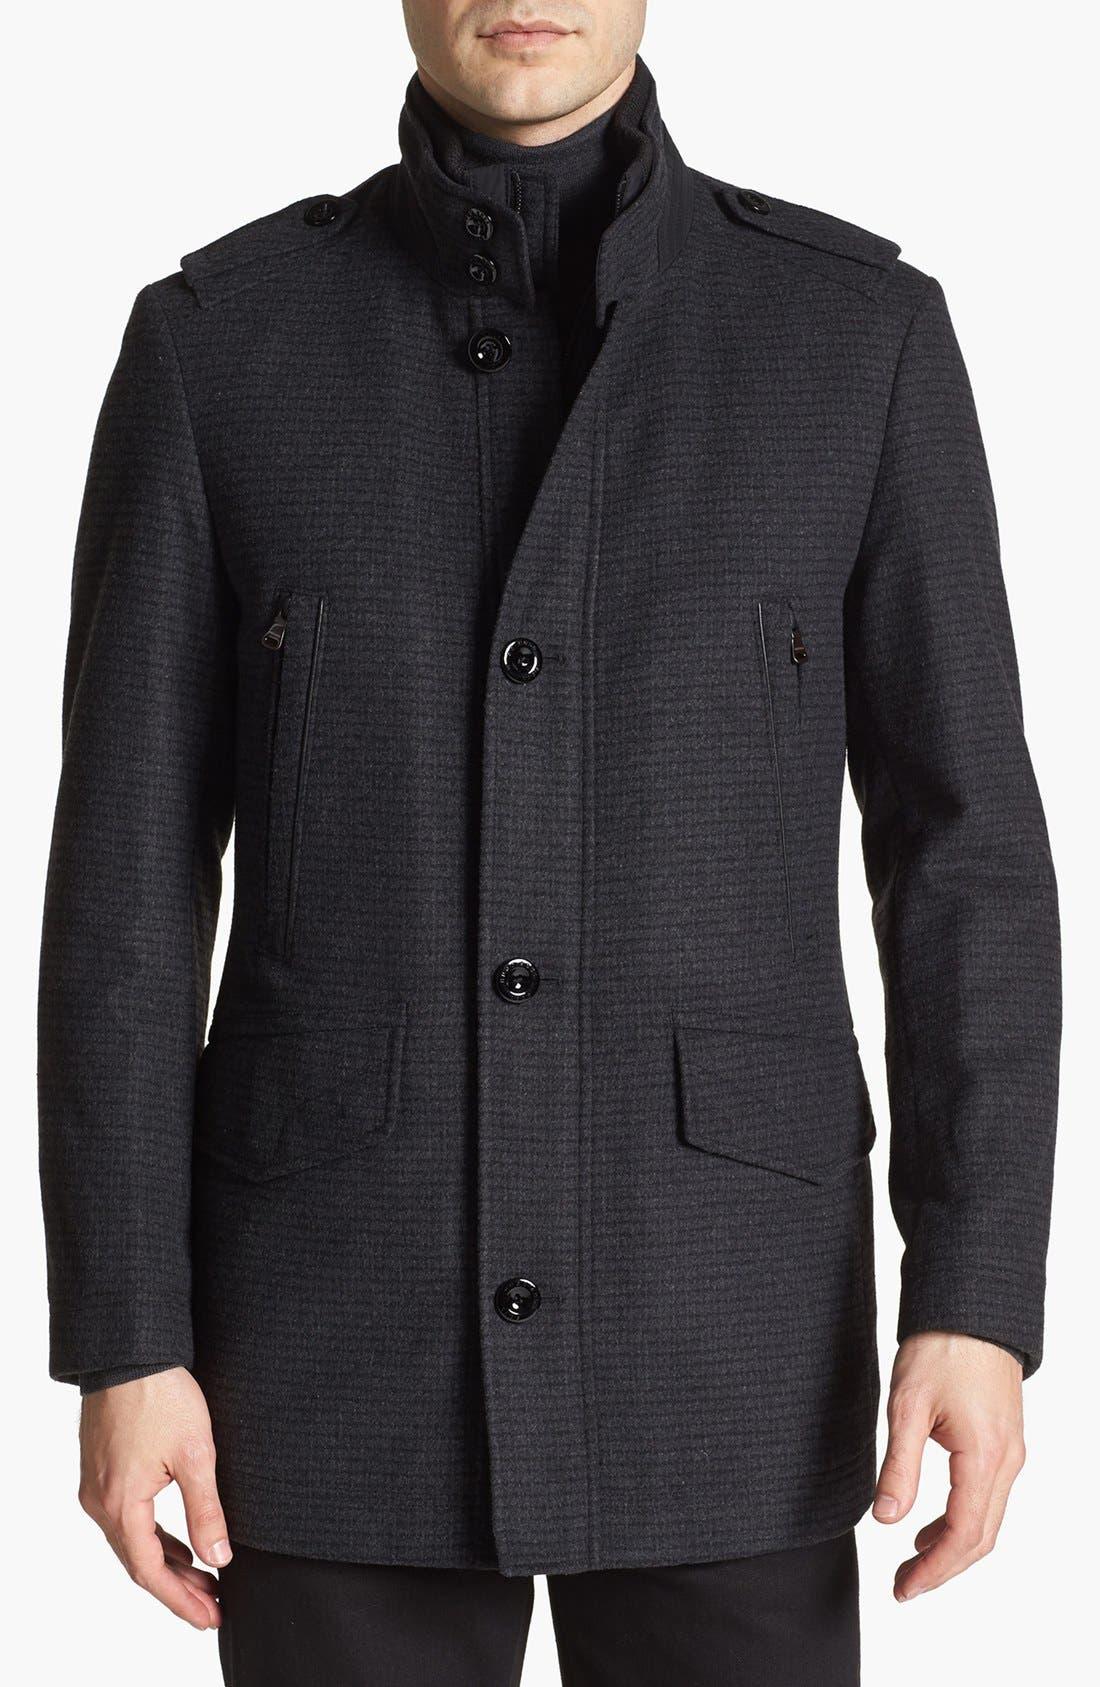 Main Image - BOSS HUGO BOSS 'Cossam' Jacket